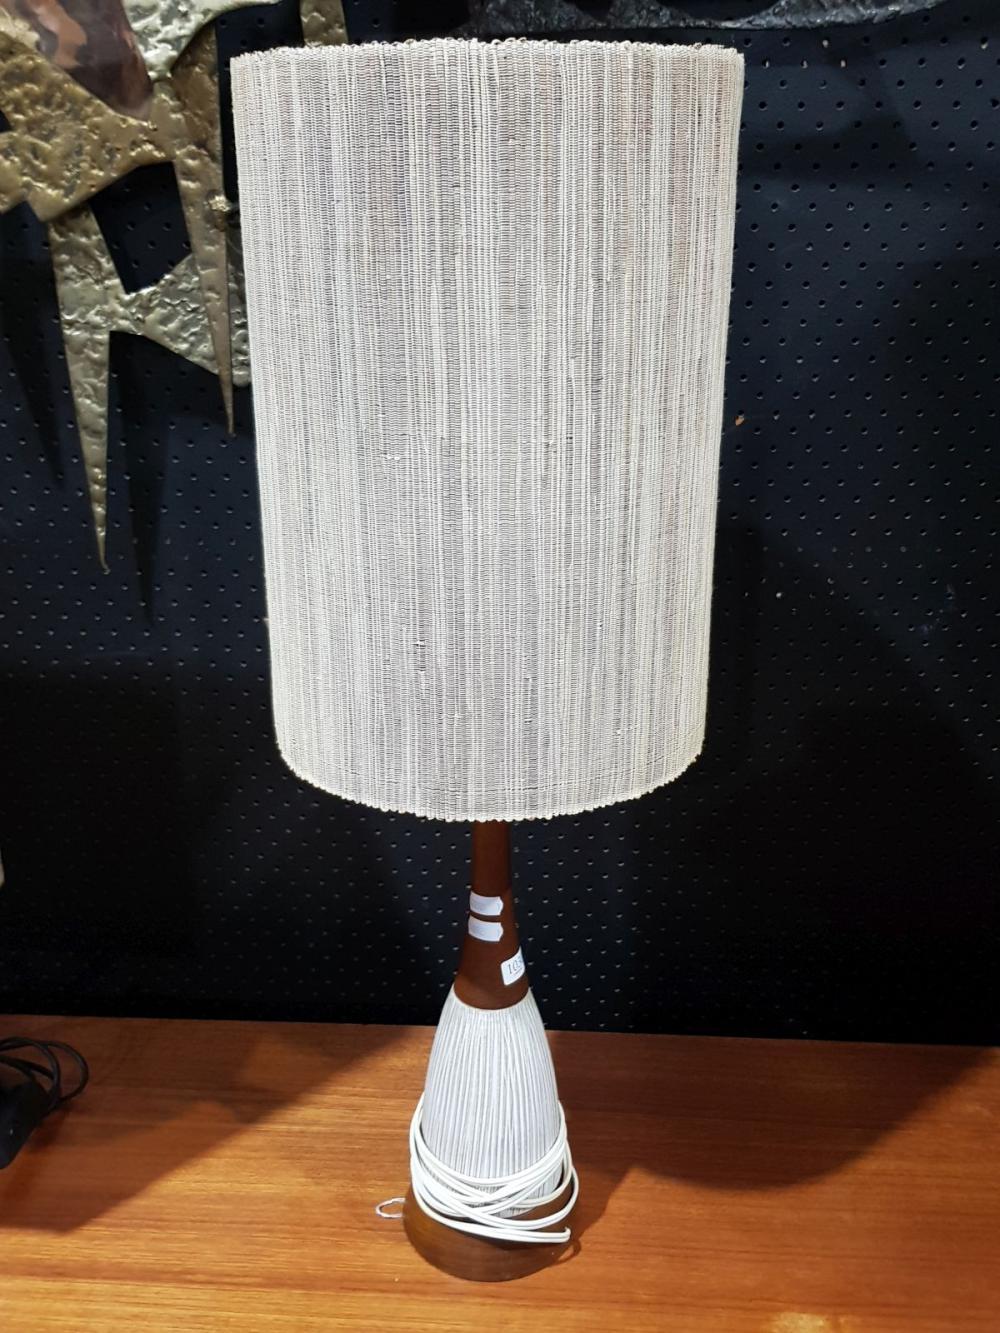 Teak and Ceramic Vintage Table Lamp